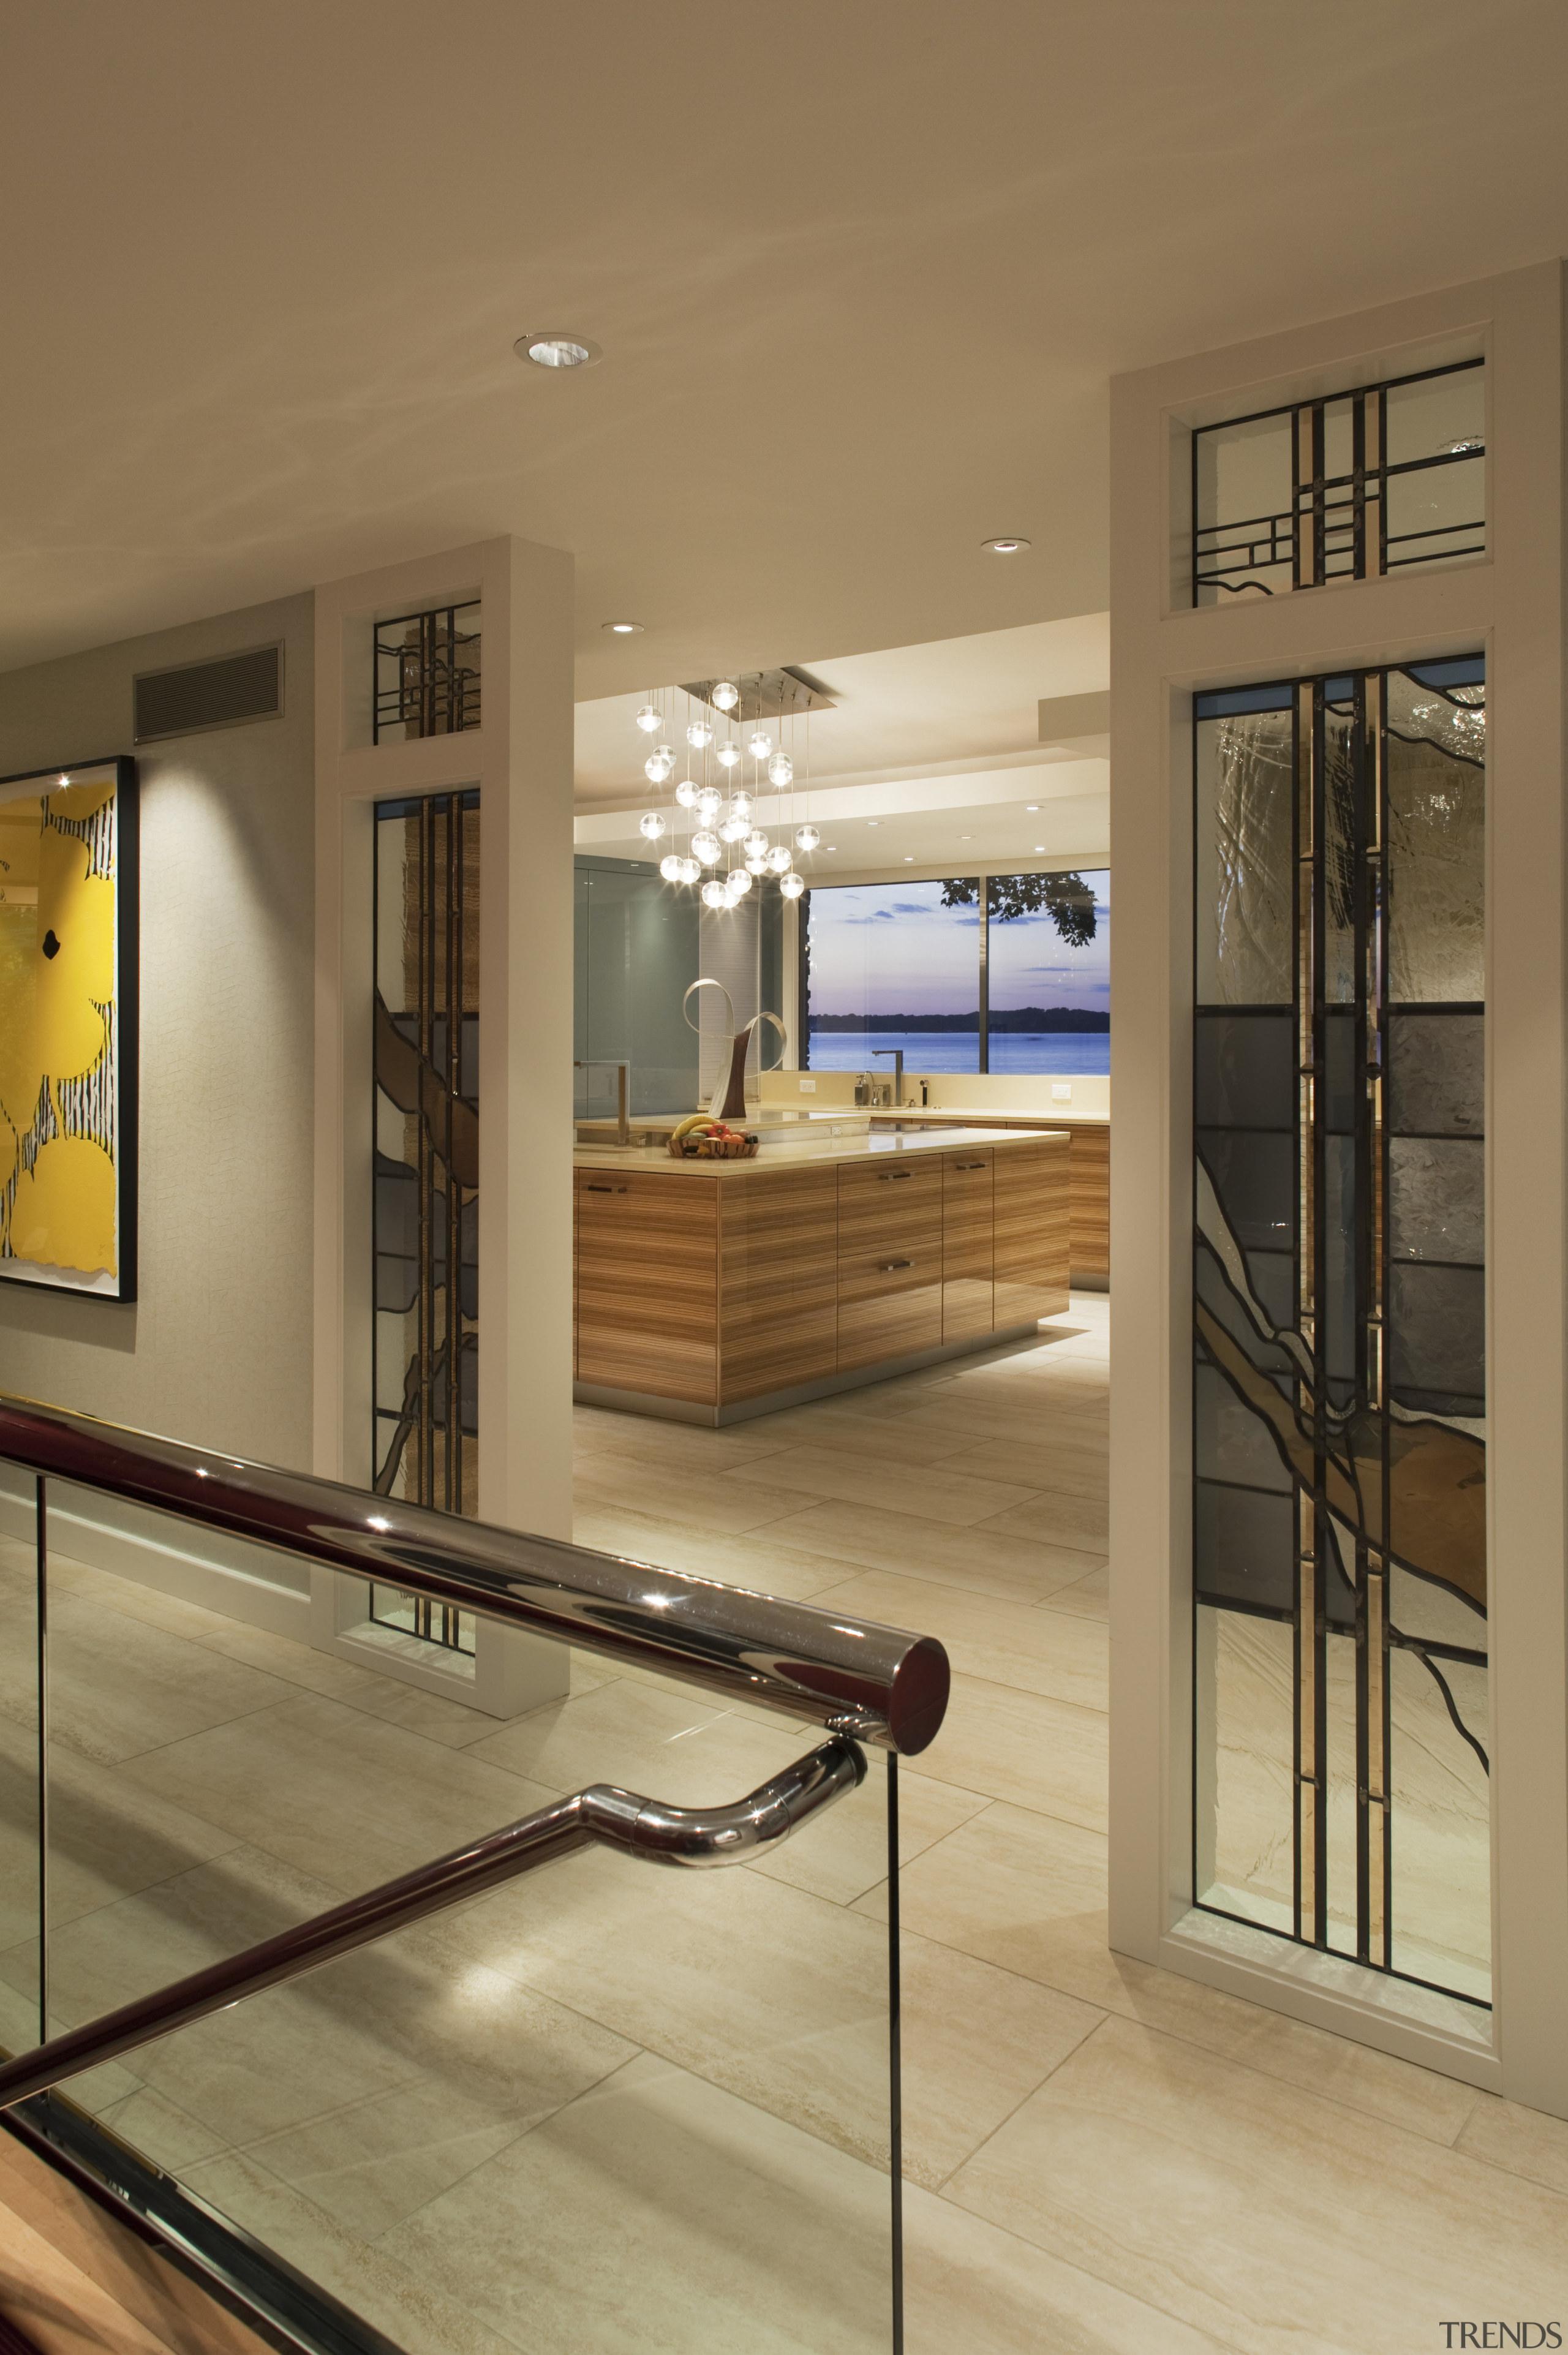 View fo kitchen remodelled with Zebrano Vaneer.  floor, flooring, glass, home, interior design, lobby, window, wood, brown, orange